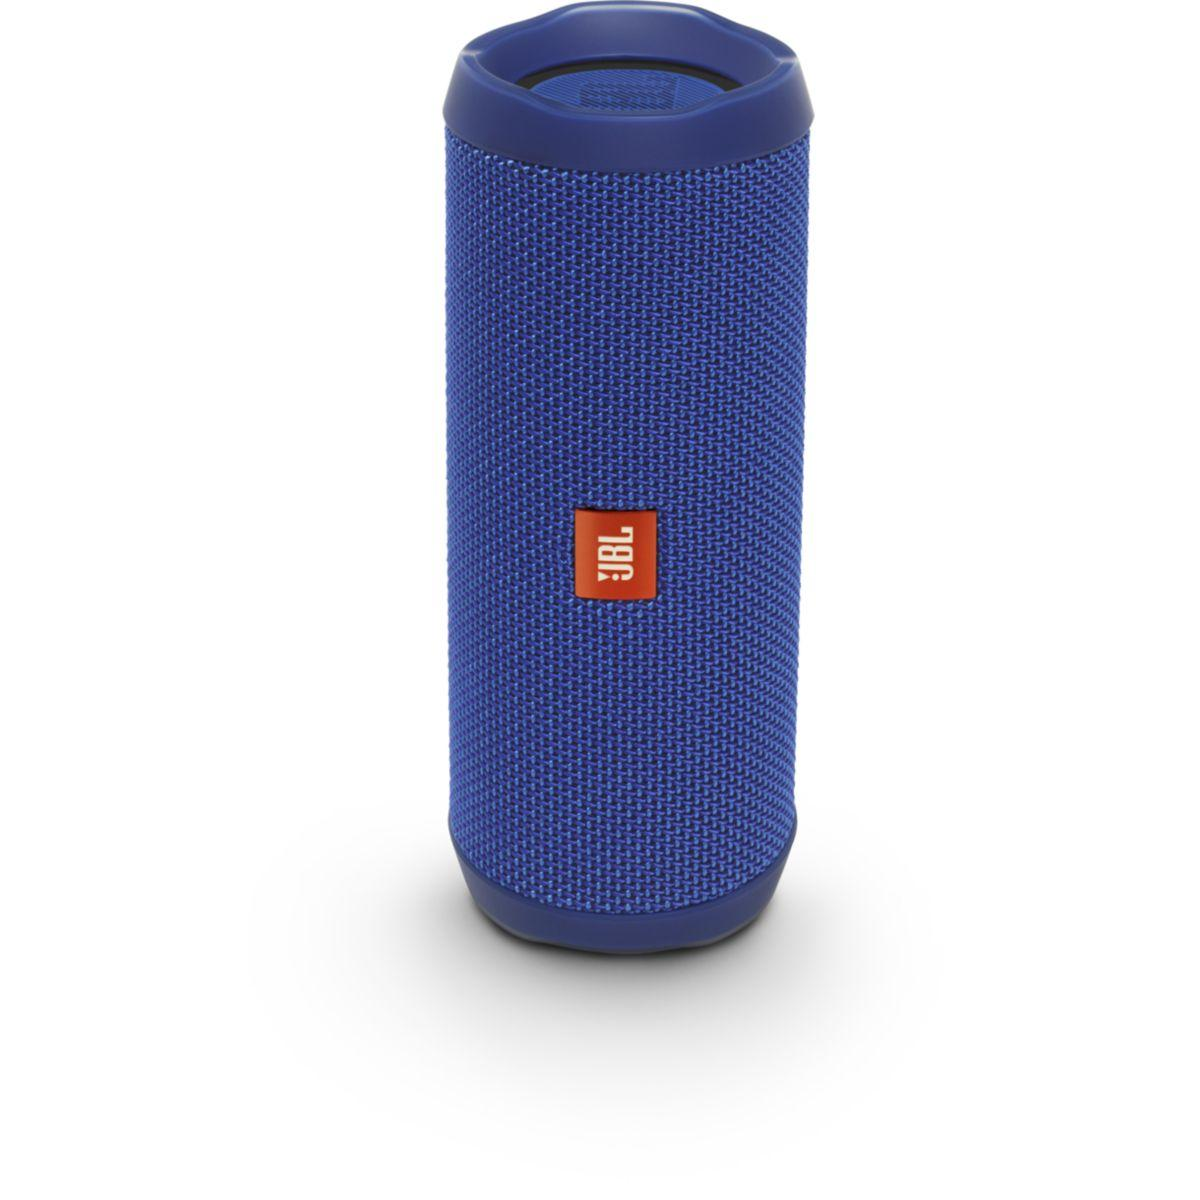 Enceinte bluetooth jbl flip 4 bleu - livraison offerte : code premium (photo)